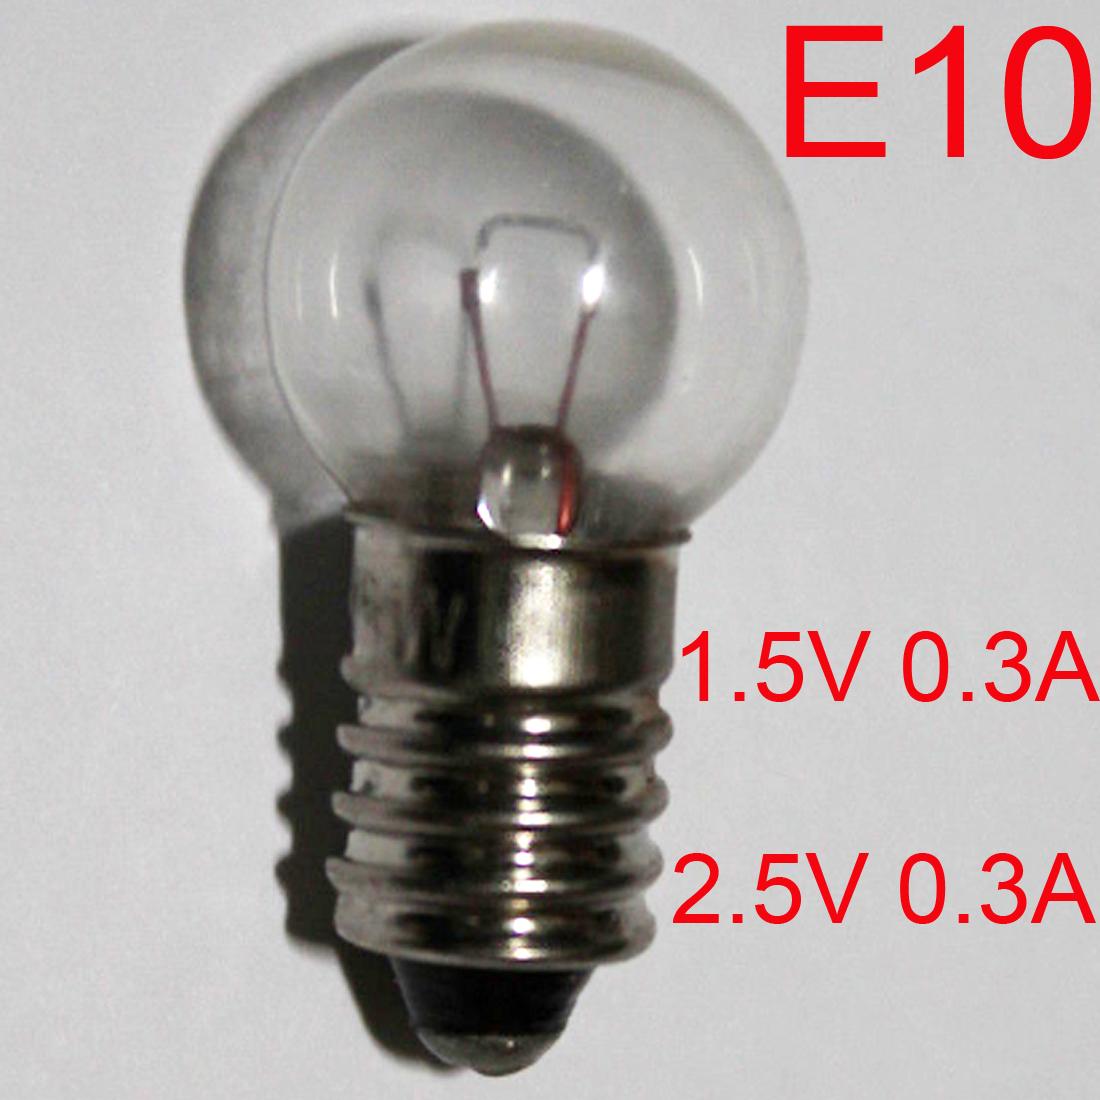 5x 12v volt LES Lilliput flashlight edison screw bulb UK Stock Size 16 mm x 5 mm